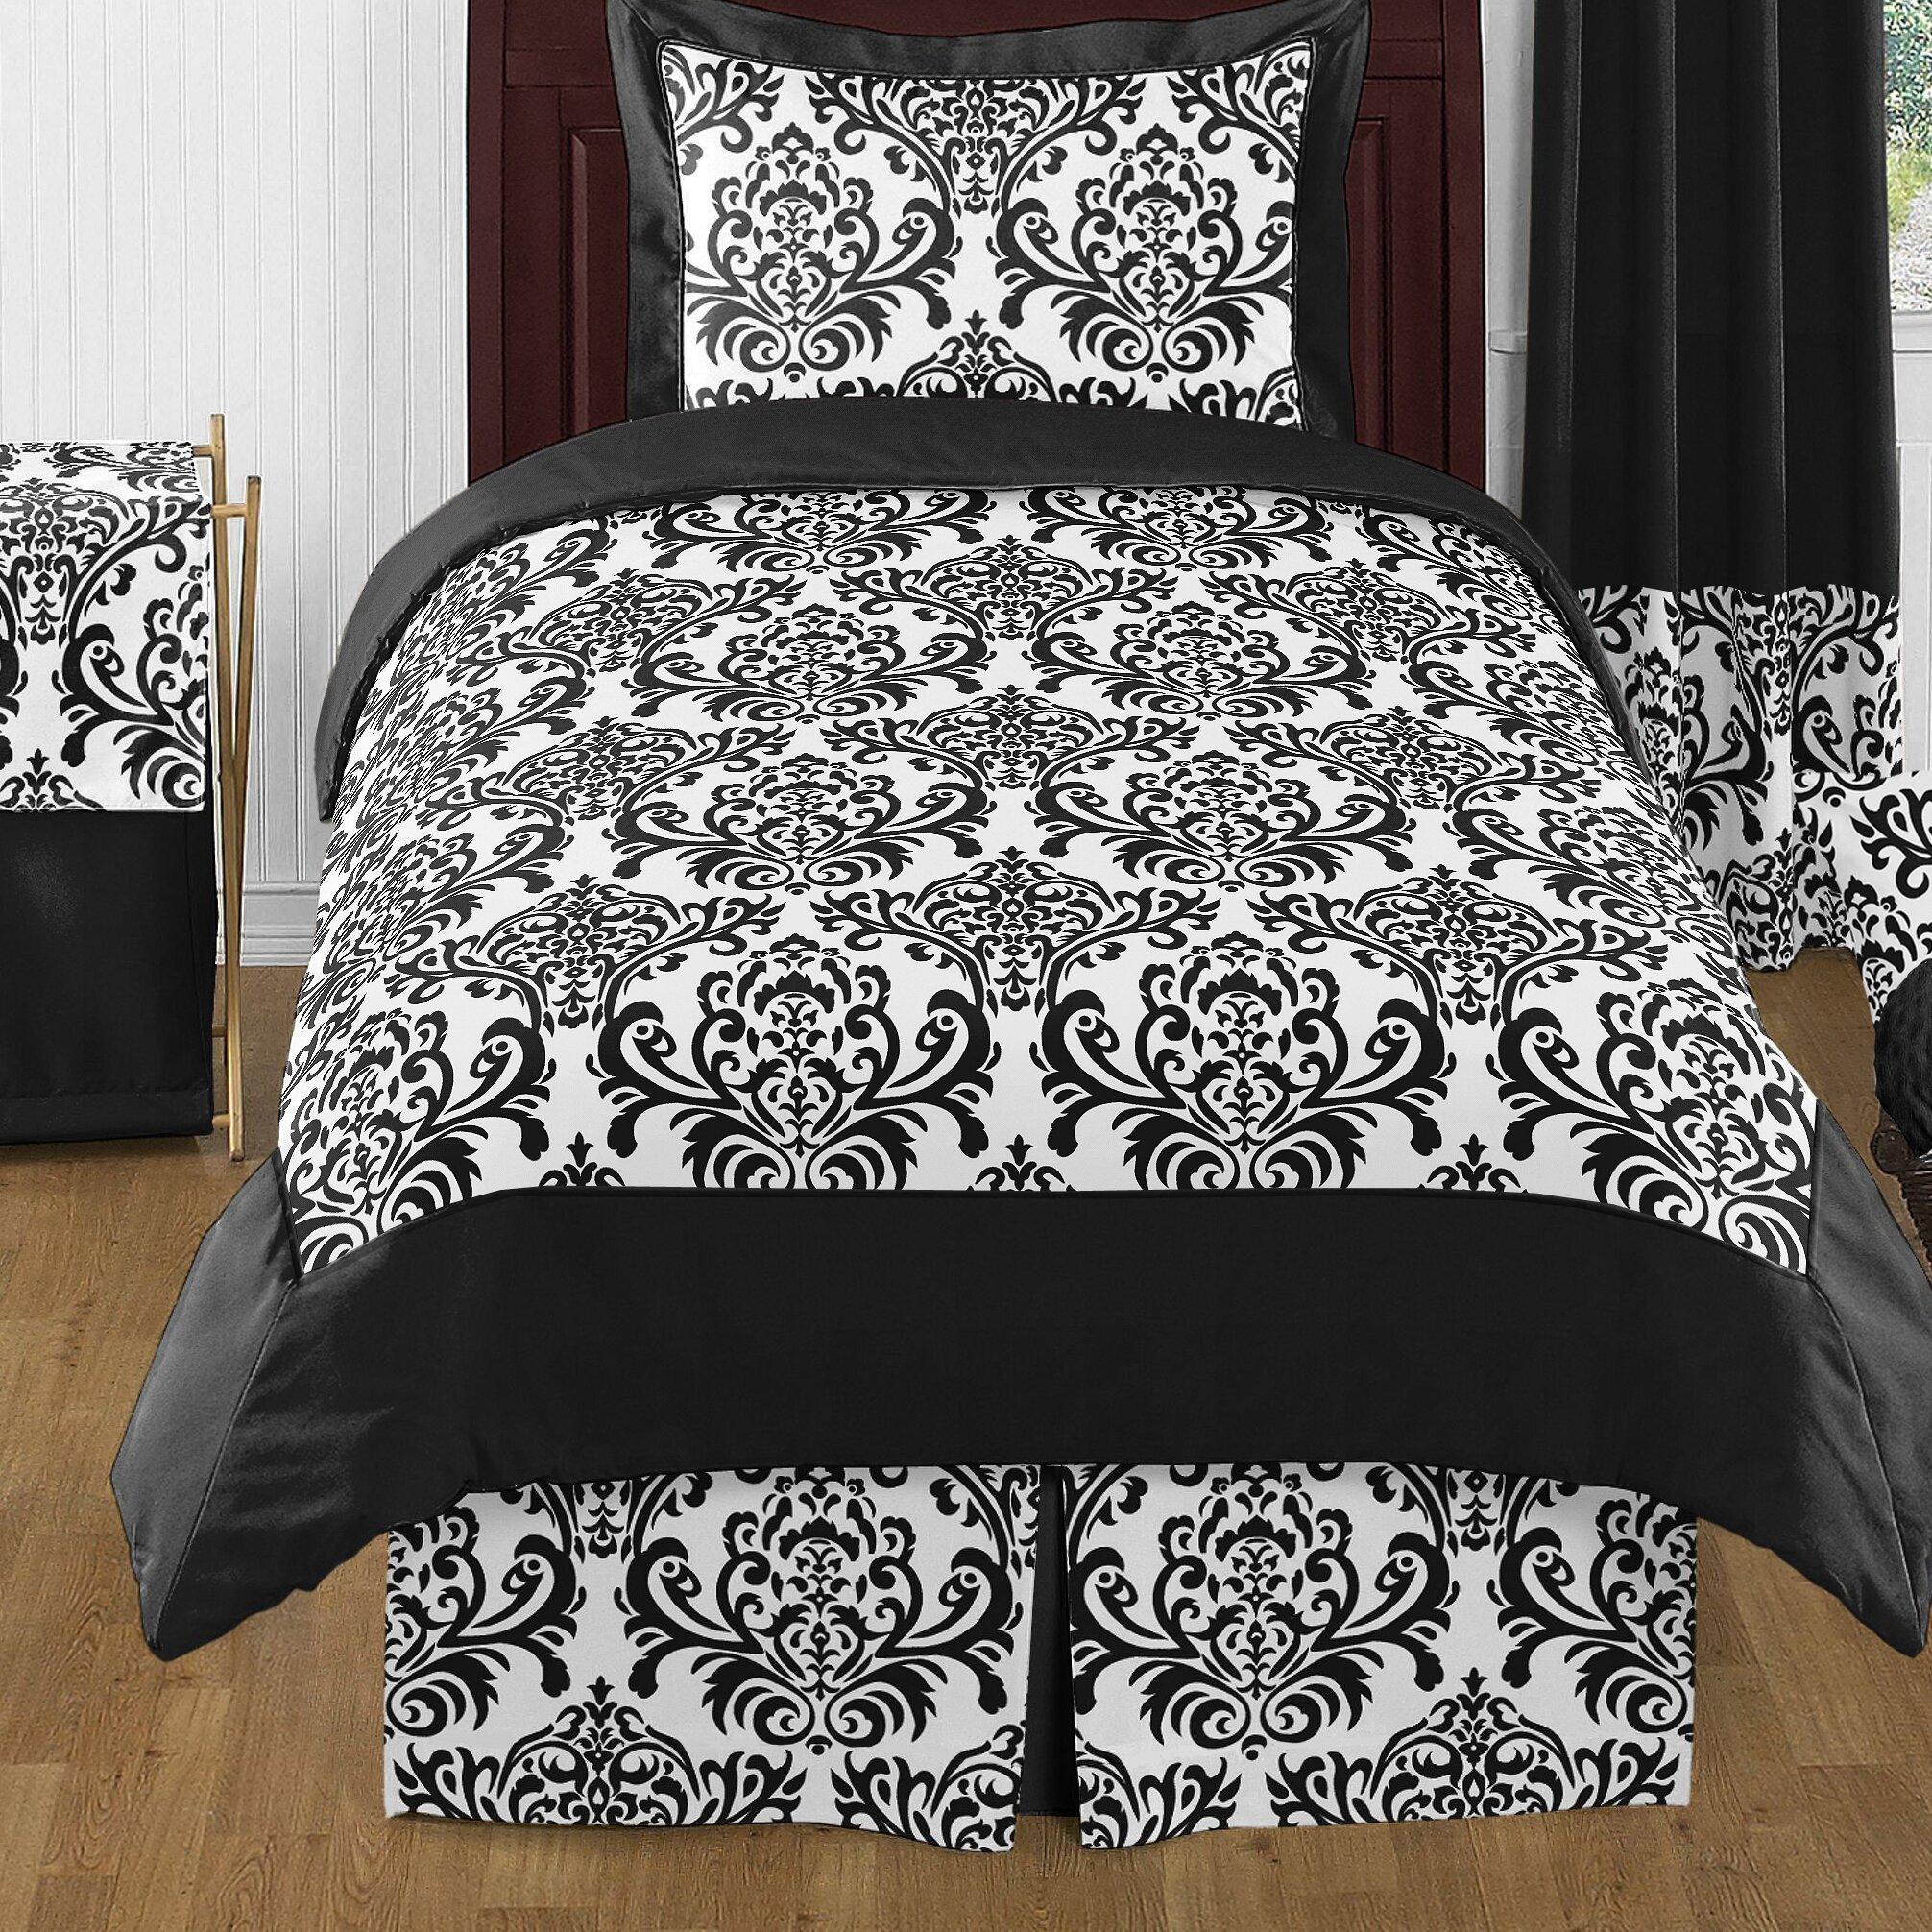 Sweet jojo designs isabella black and white 3 piece full queen comforter set reviews wayfair - Black and white design comforter ...